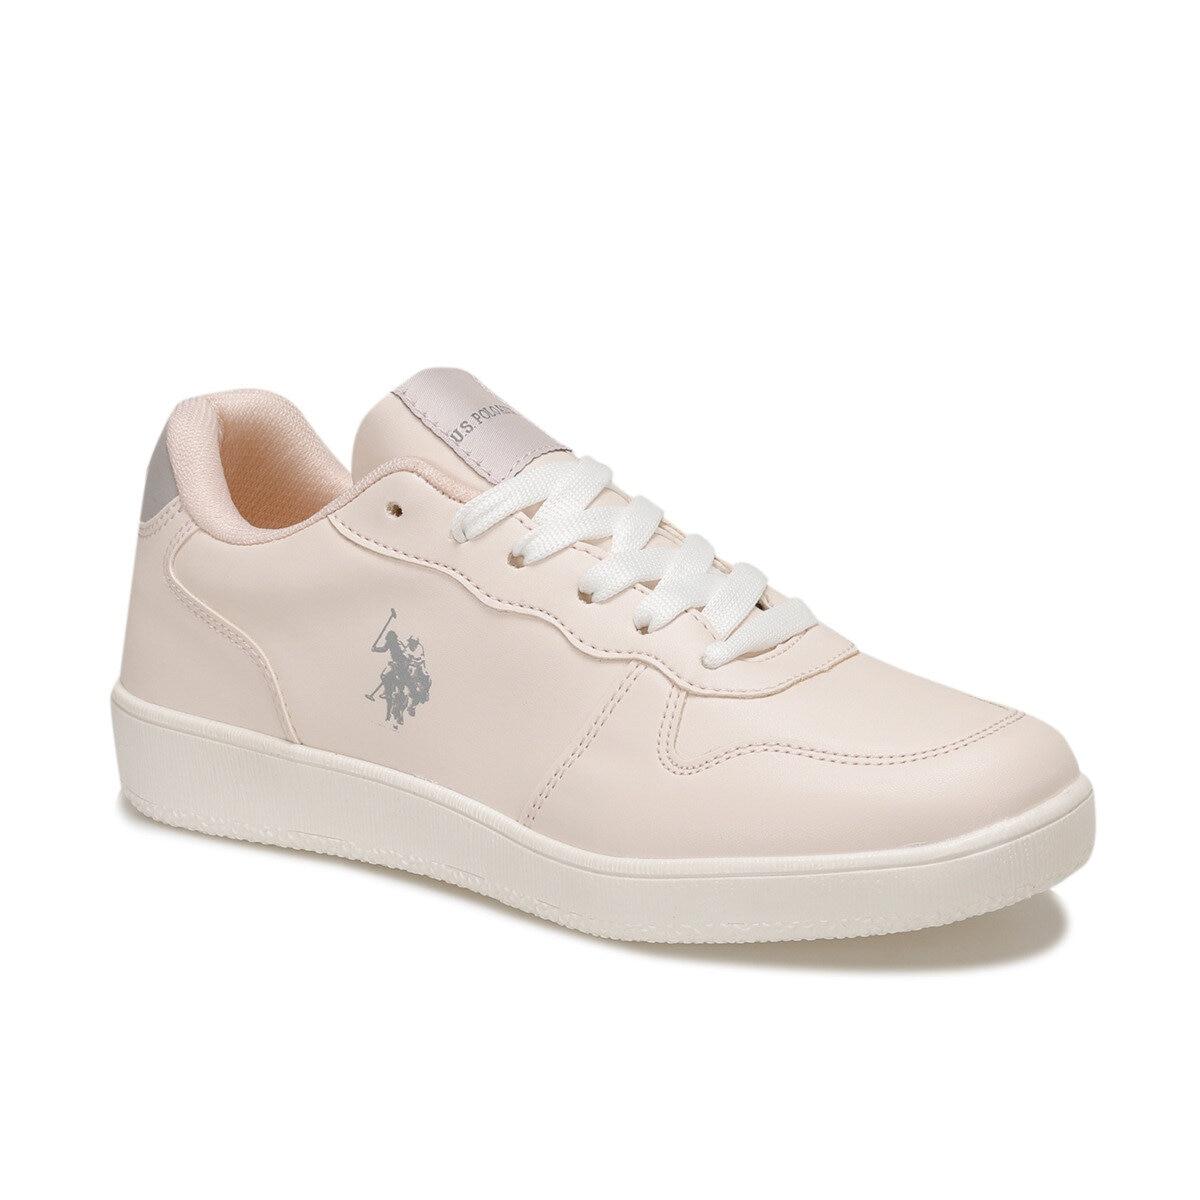 FLO USNEA Powder Women 'S Basic Casual Shoes U.S. POLO ASSN.